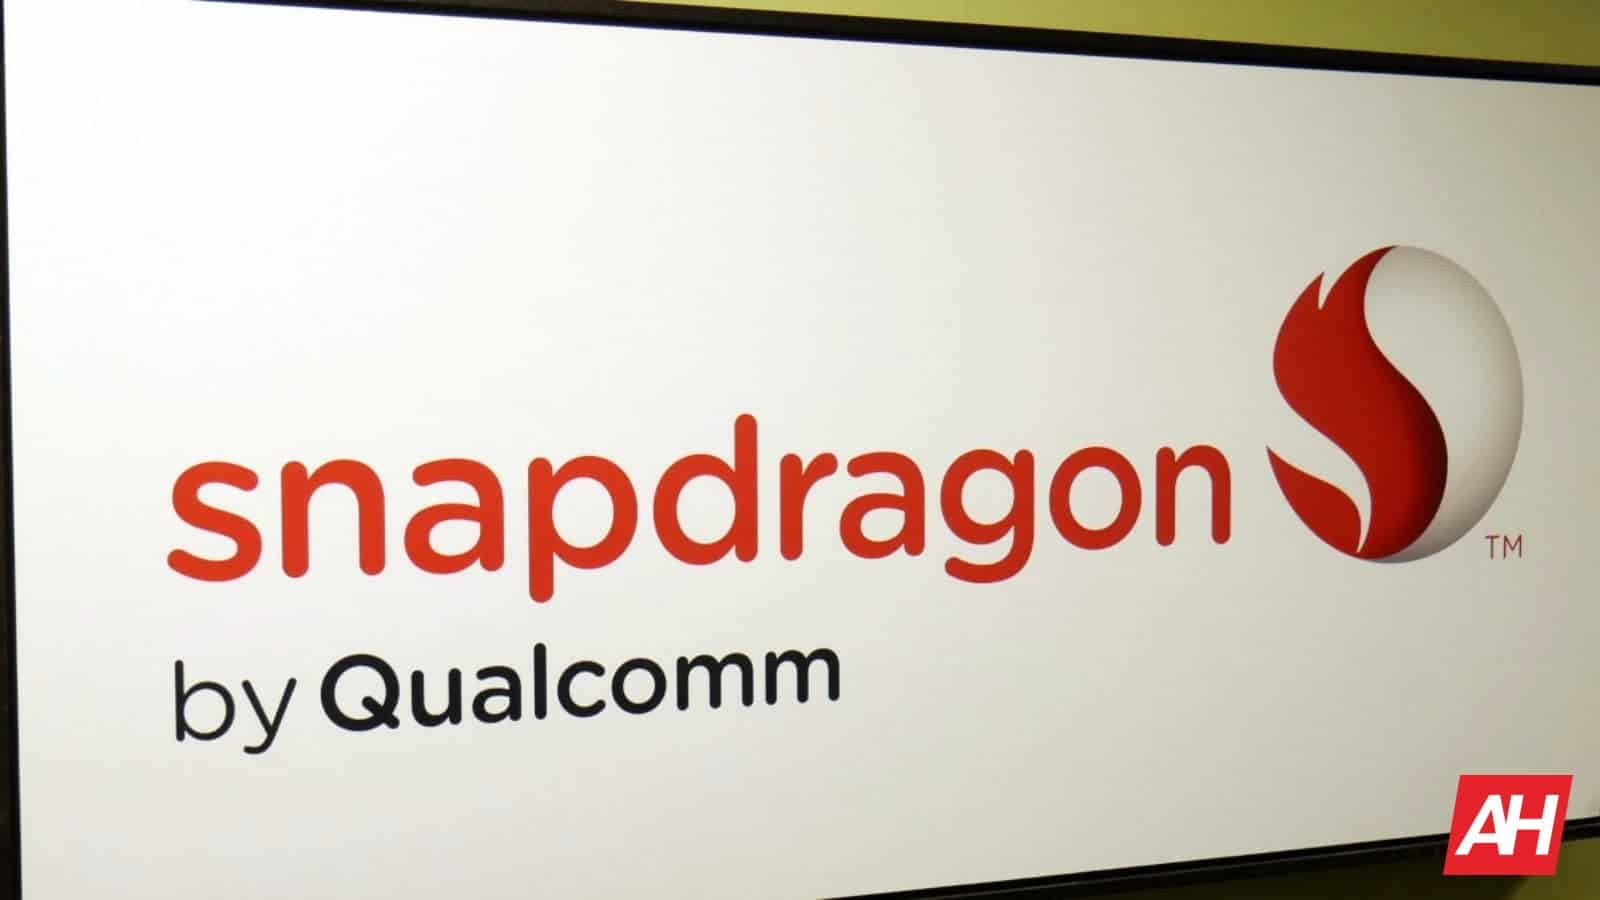 Qualcomm Snapdragon AH 49 AH 2019